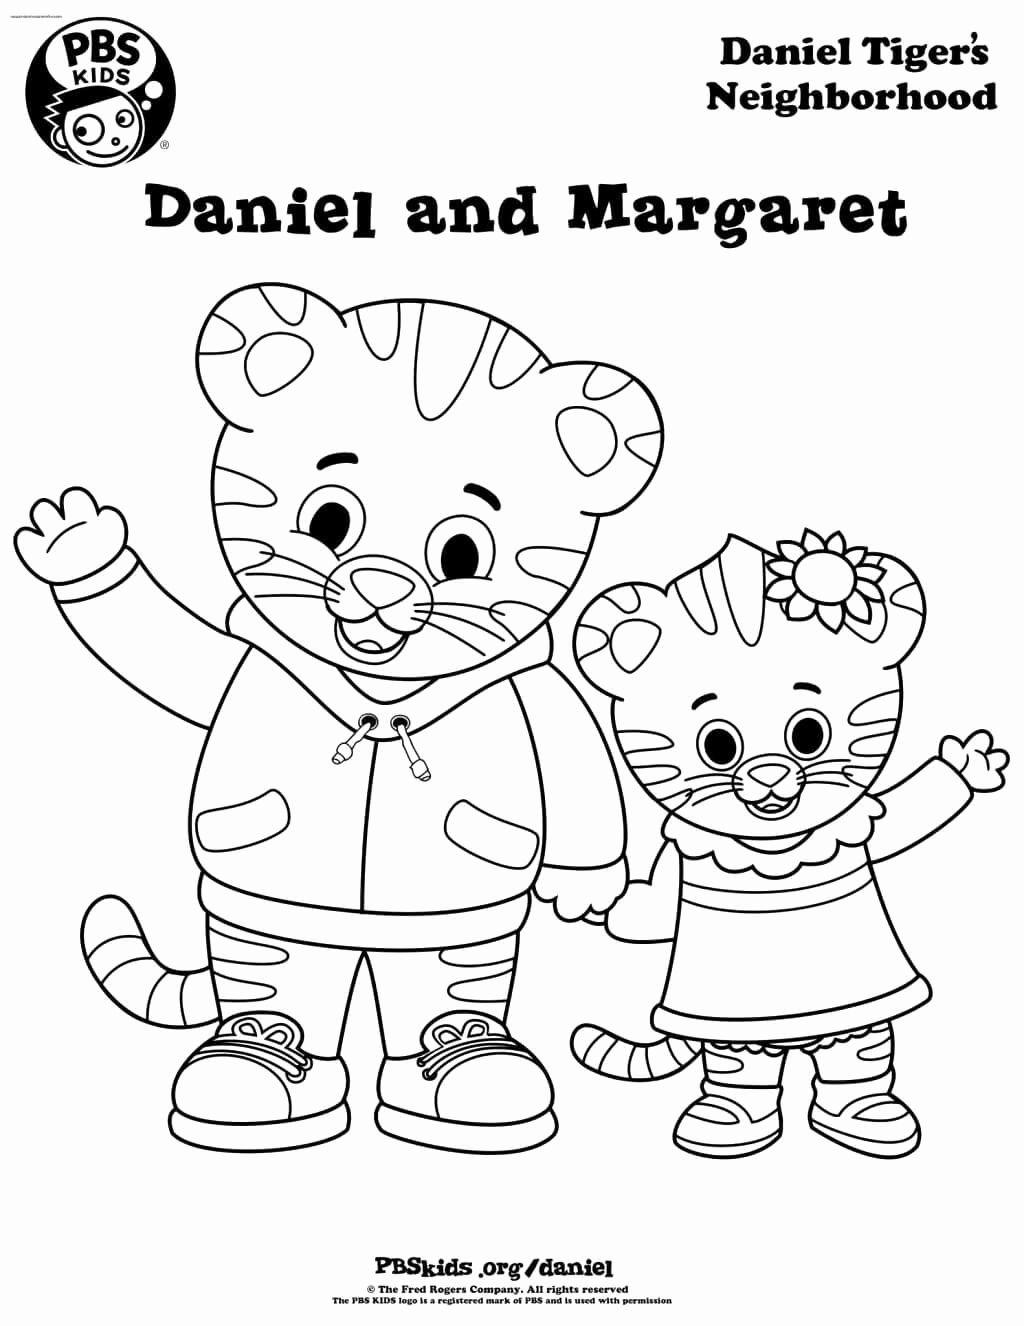 Daniel Tiger Coloring Pages In 2020 Daniel Tiger Daniel Tiger Birthday Party Daniel Tiger Birthday